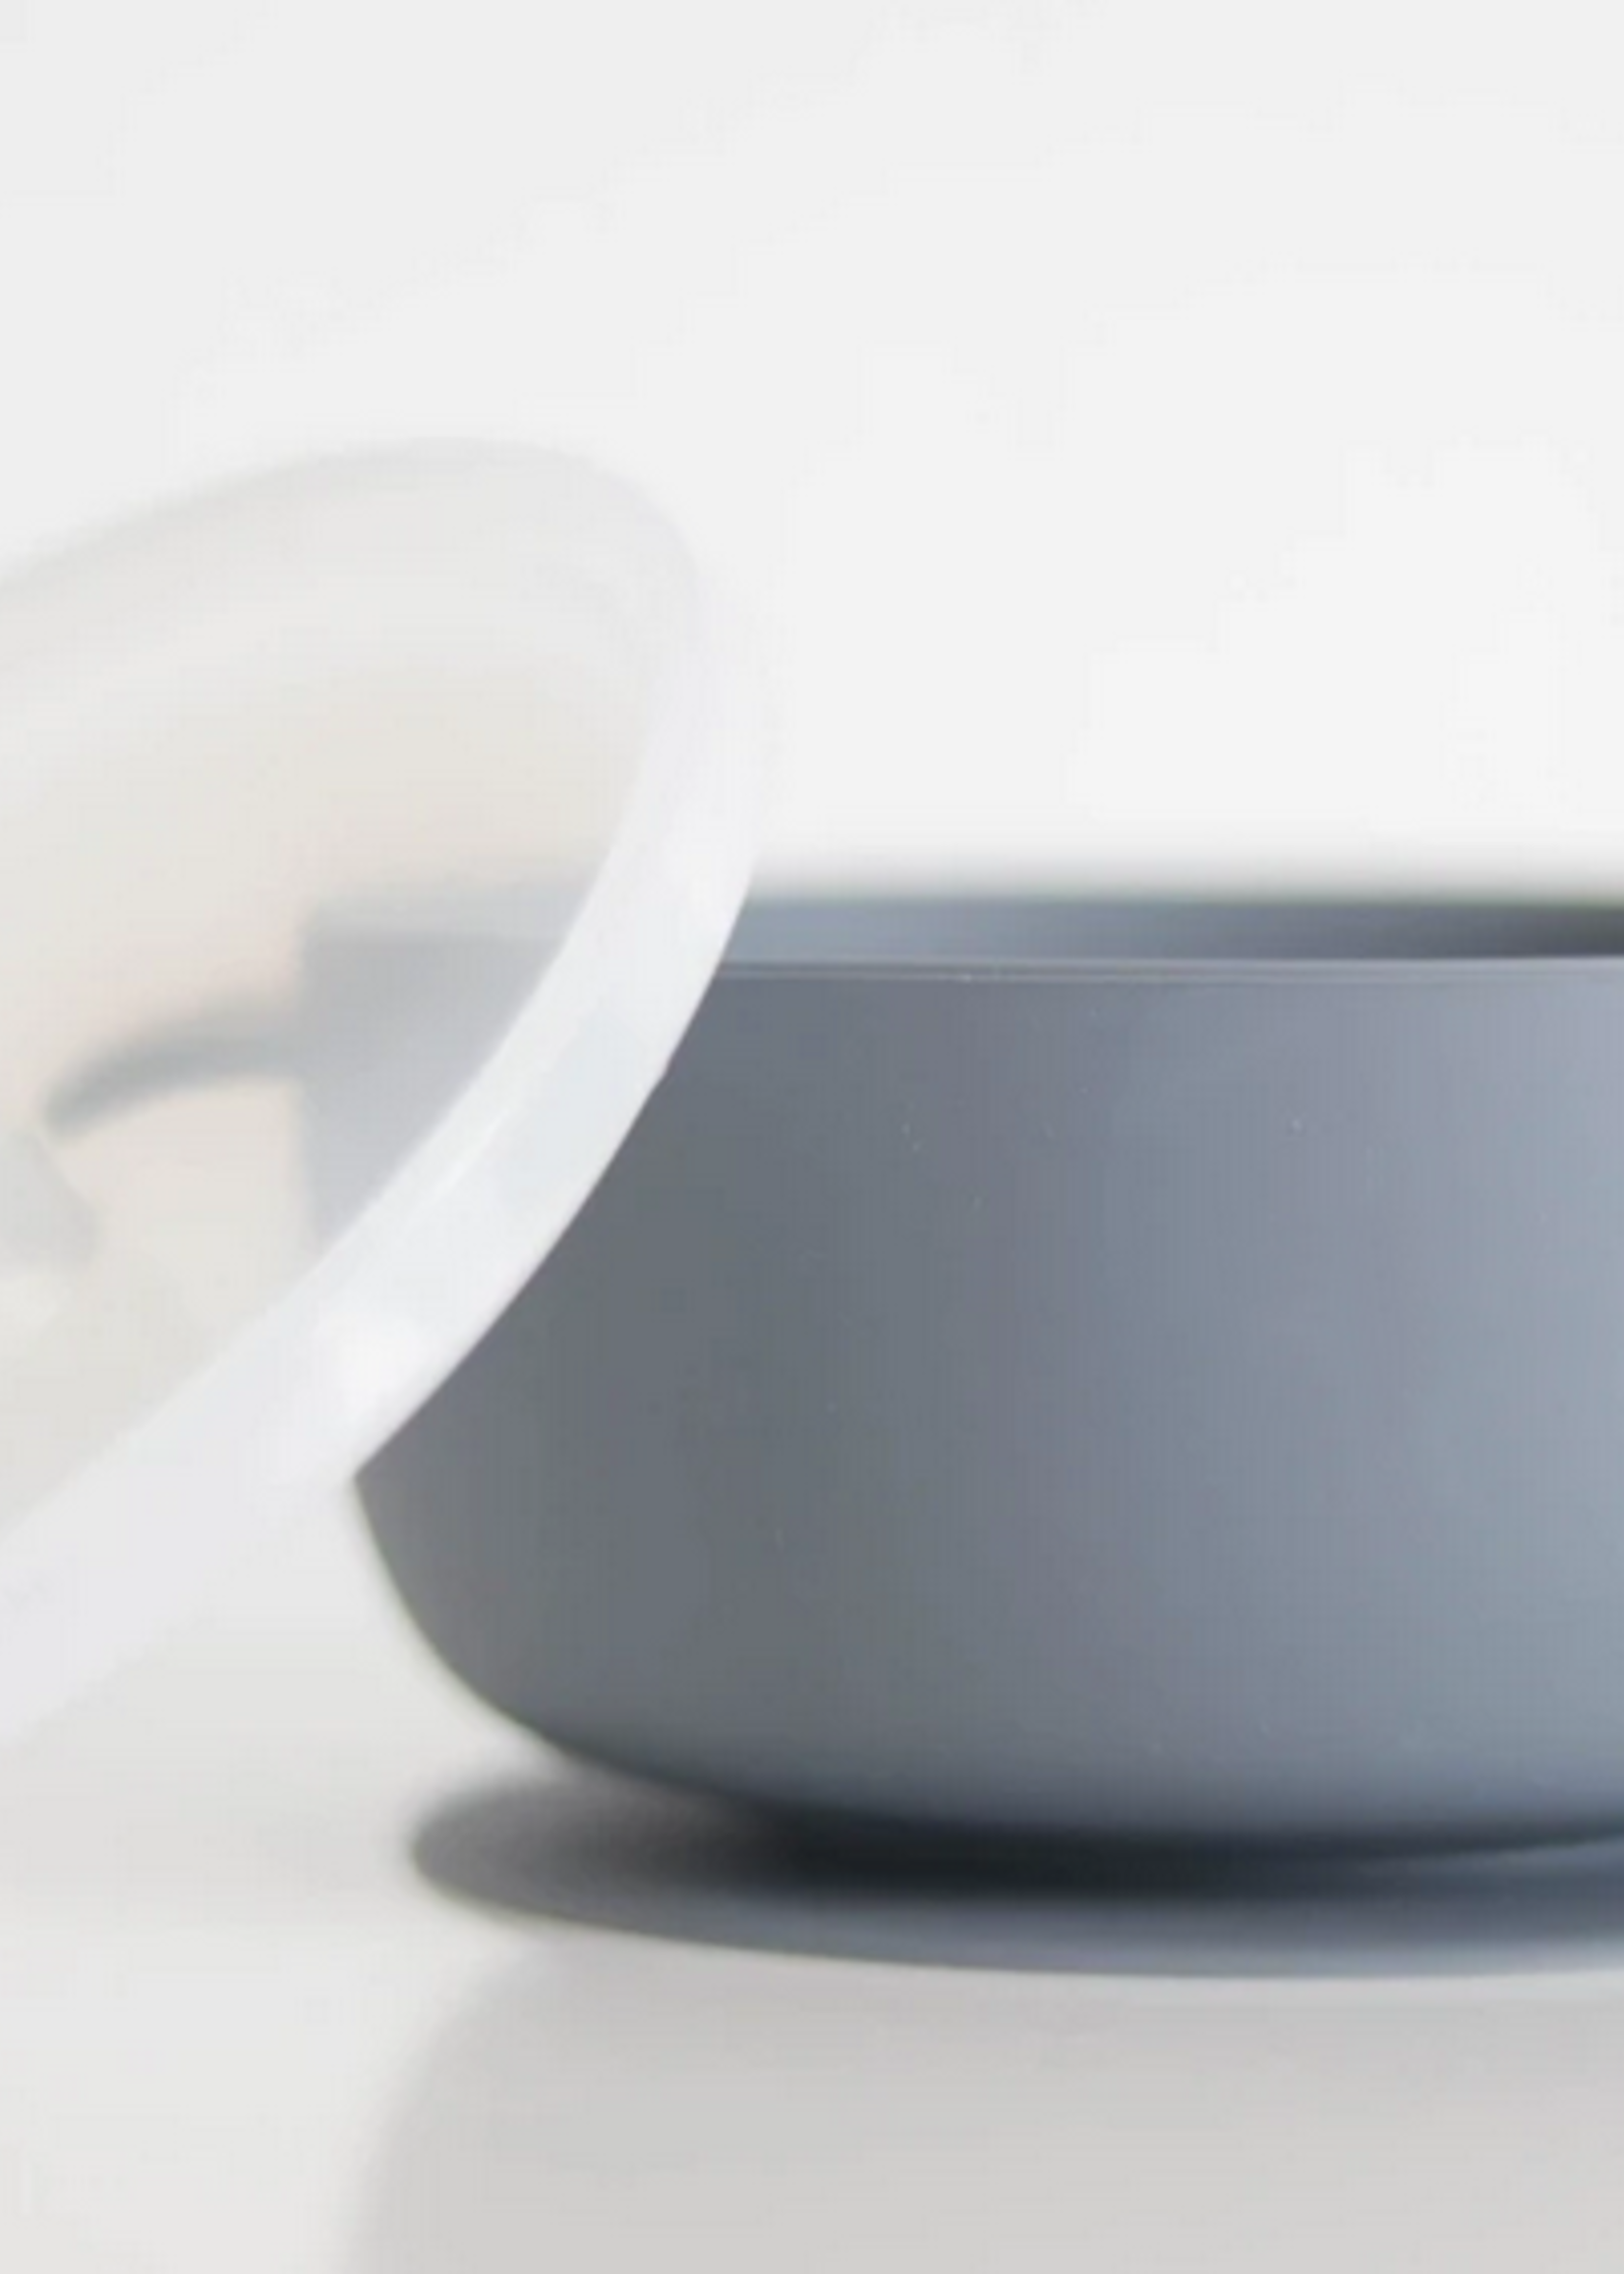 Elitaire Petite Ocean Suction Bowl with Lid